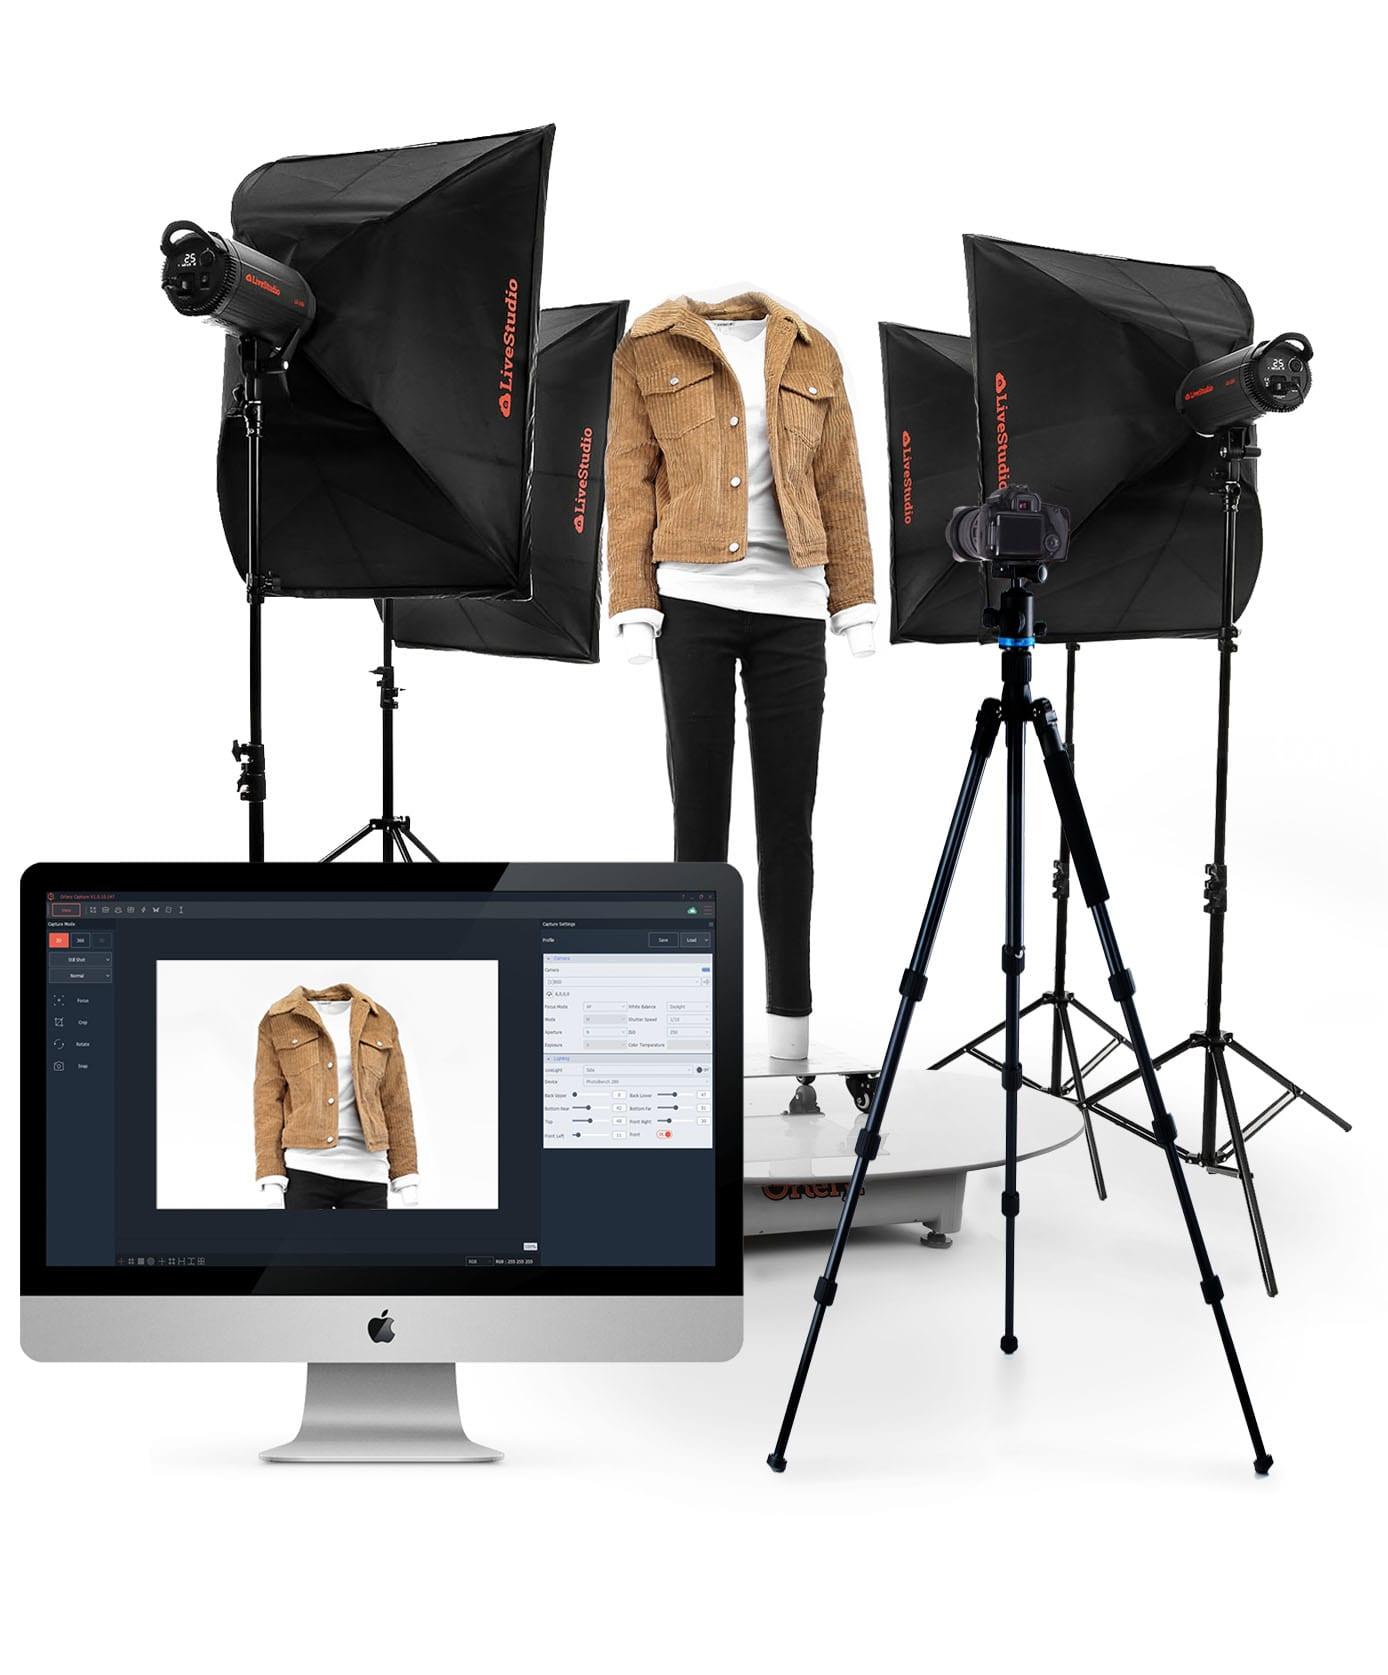 software-controlled-livestudio-photocapture-360m